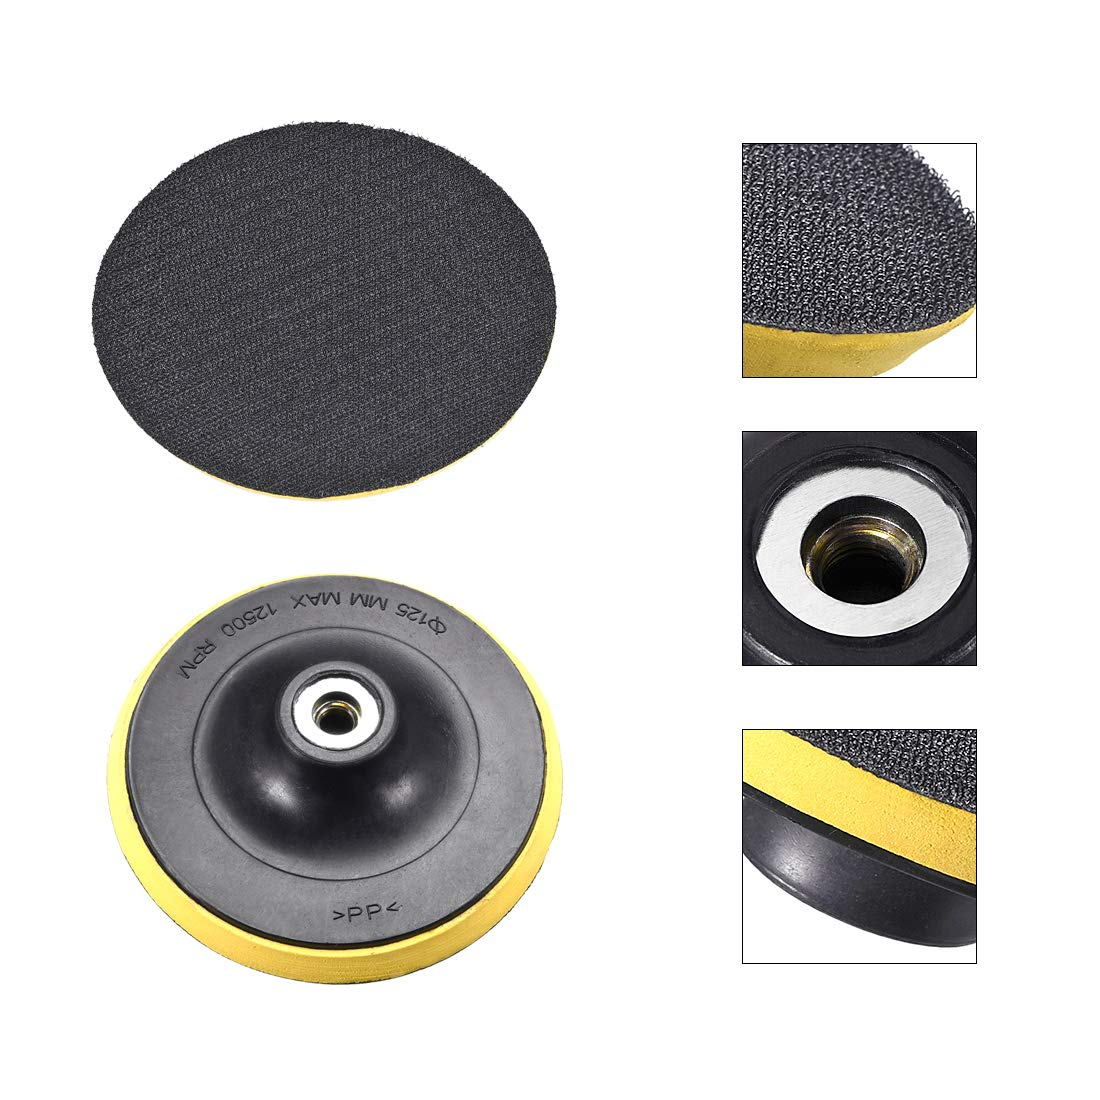 Orbital Sander Polisher Polishing Sanding Pad M10 Drill Adapter uxcell/® 4-inch Hook and Loop Backing Pad